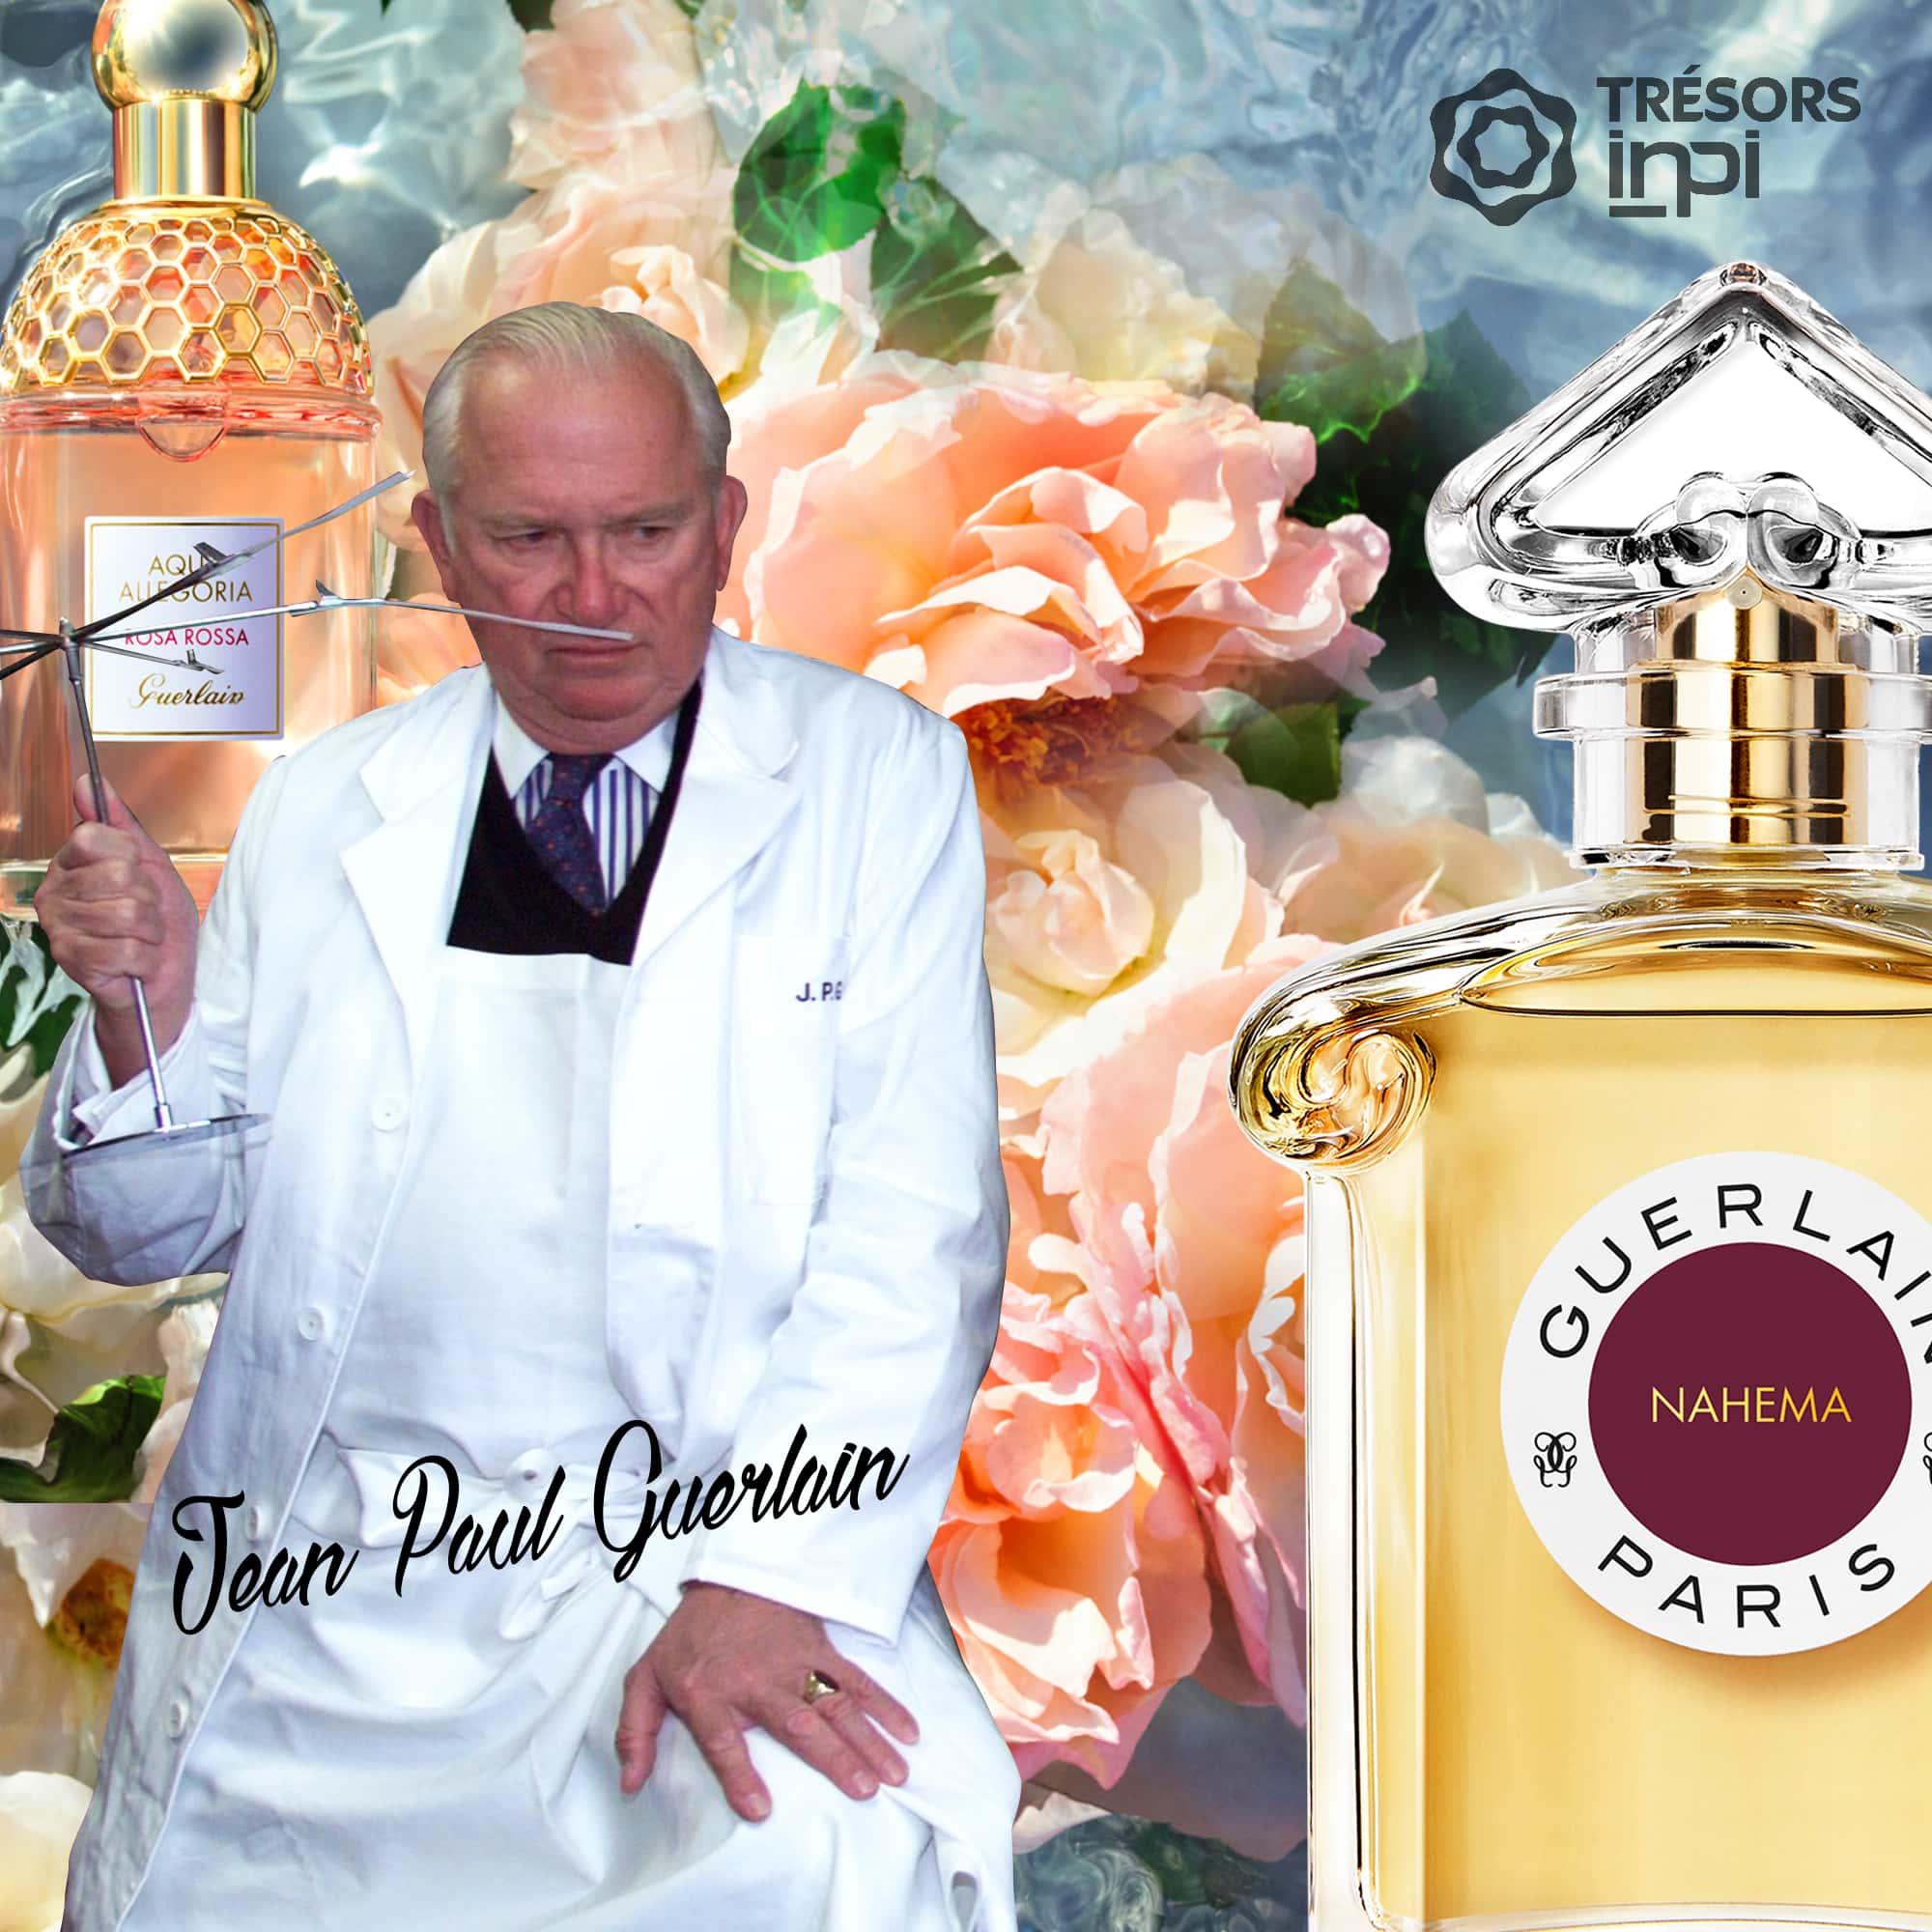 Perfumes Jean Paul Guerlain - Tresors INPI by RUNWAY MAGAZINE